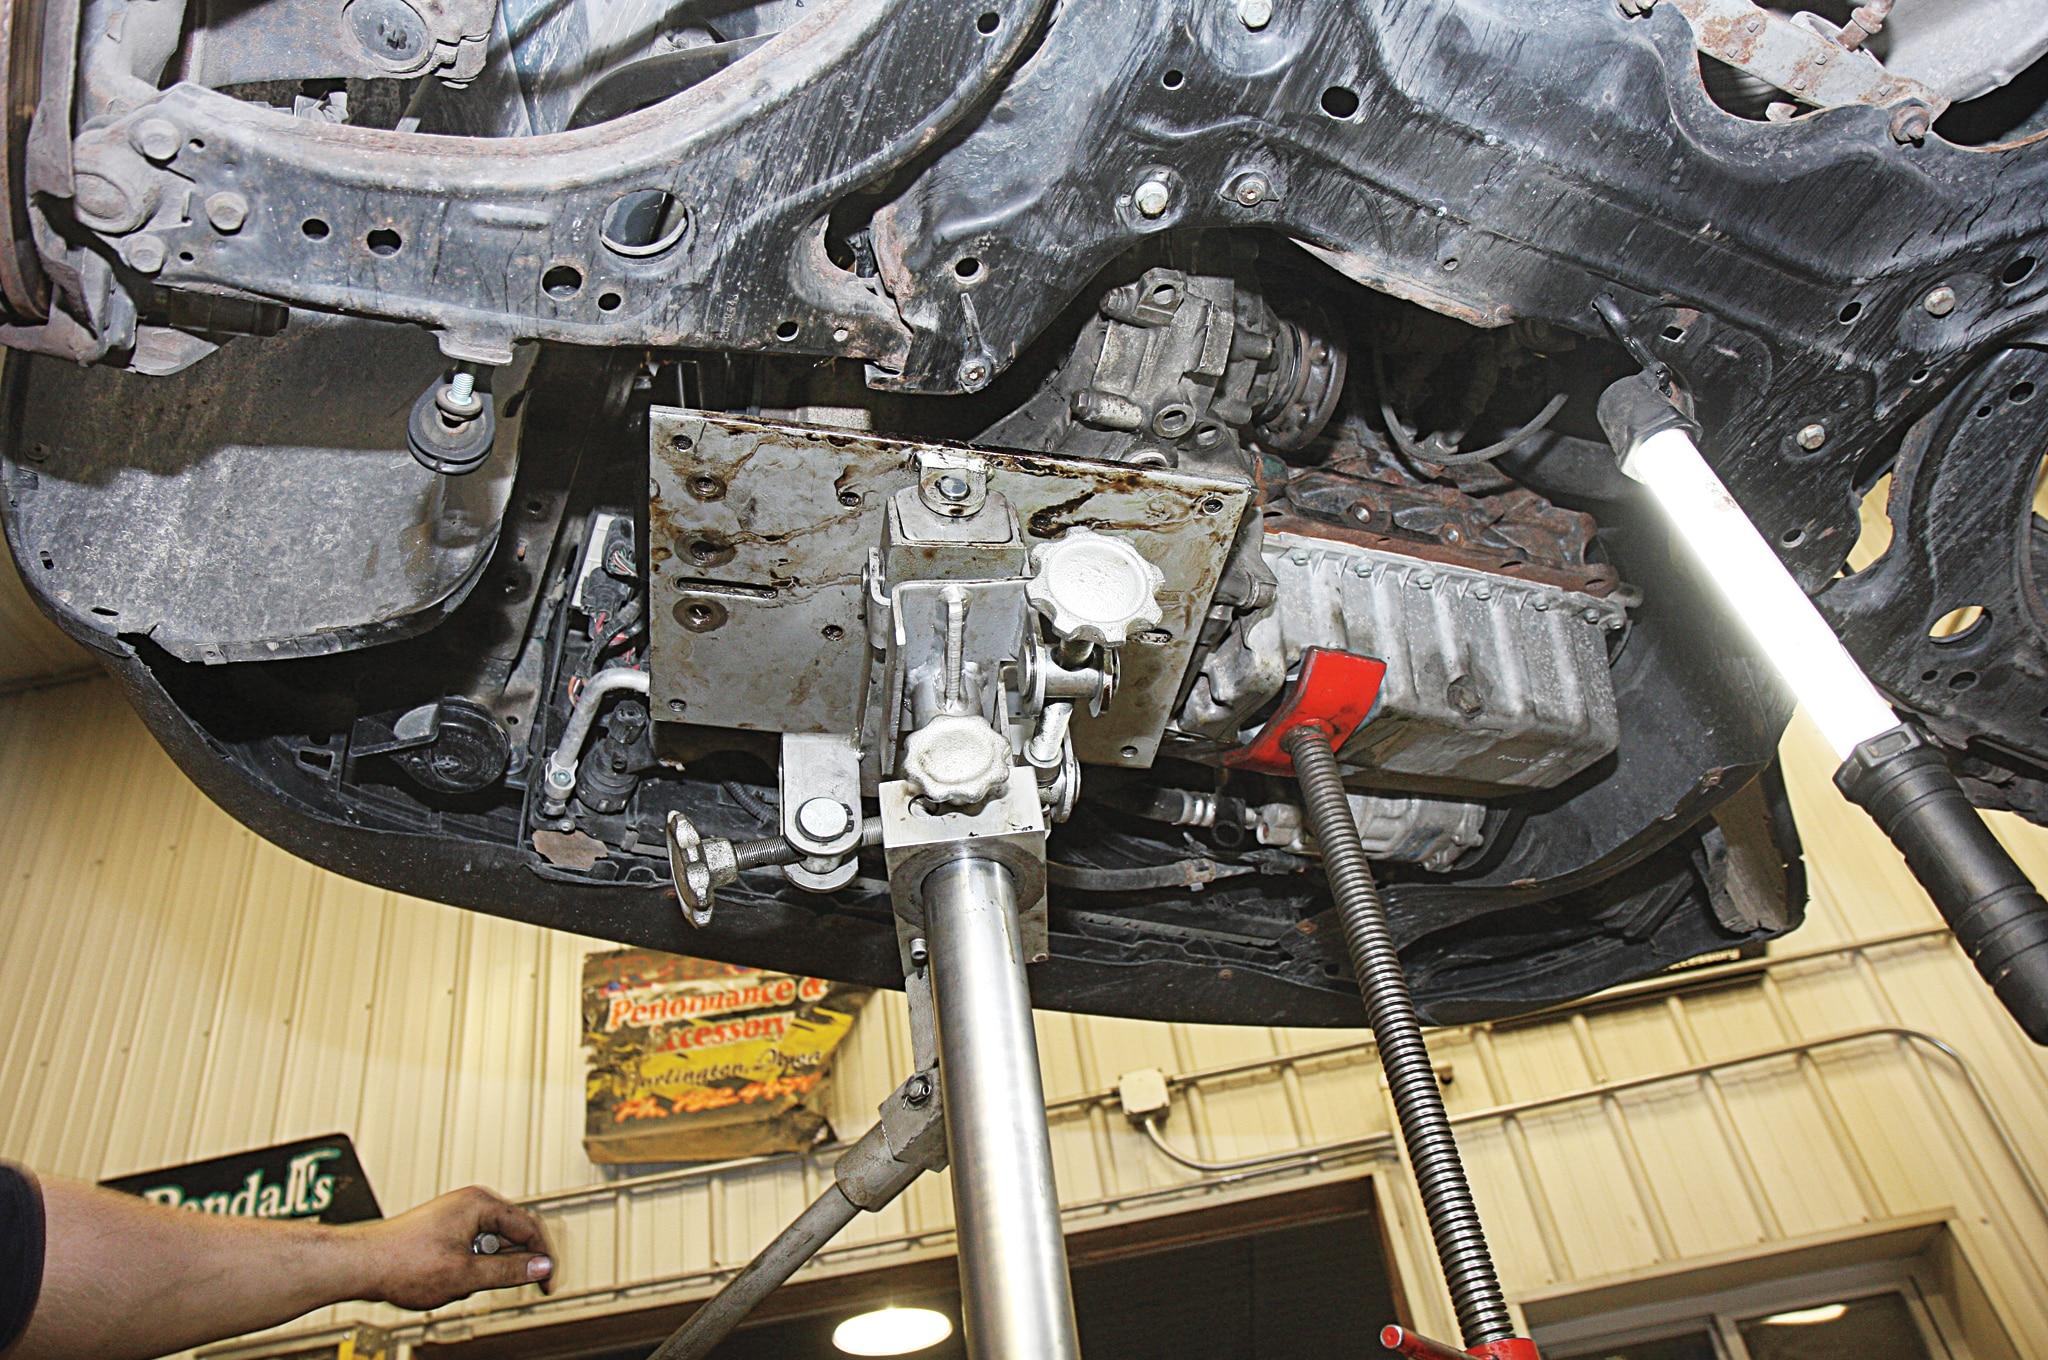 hight resolution of 2002 volkswagen jetta tdi 5 speed transmission view photo gallery 13 photos